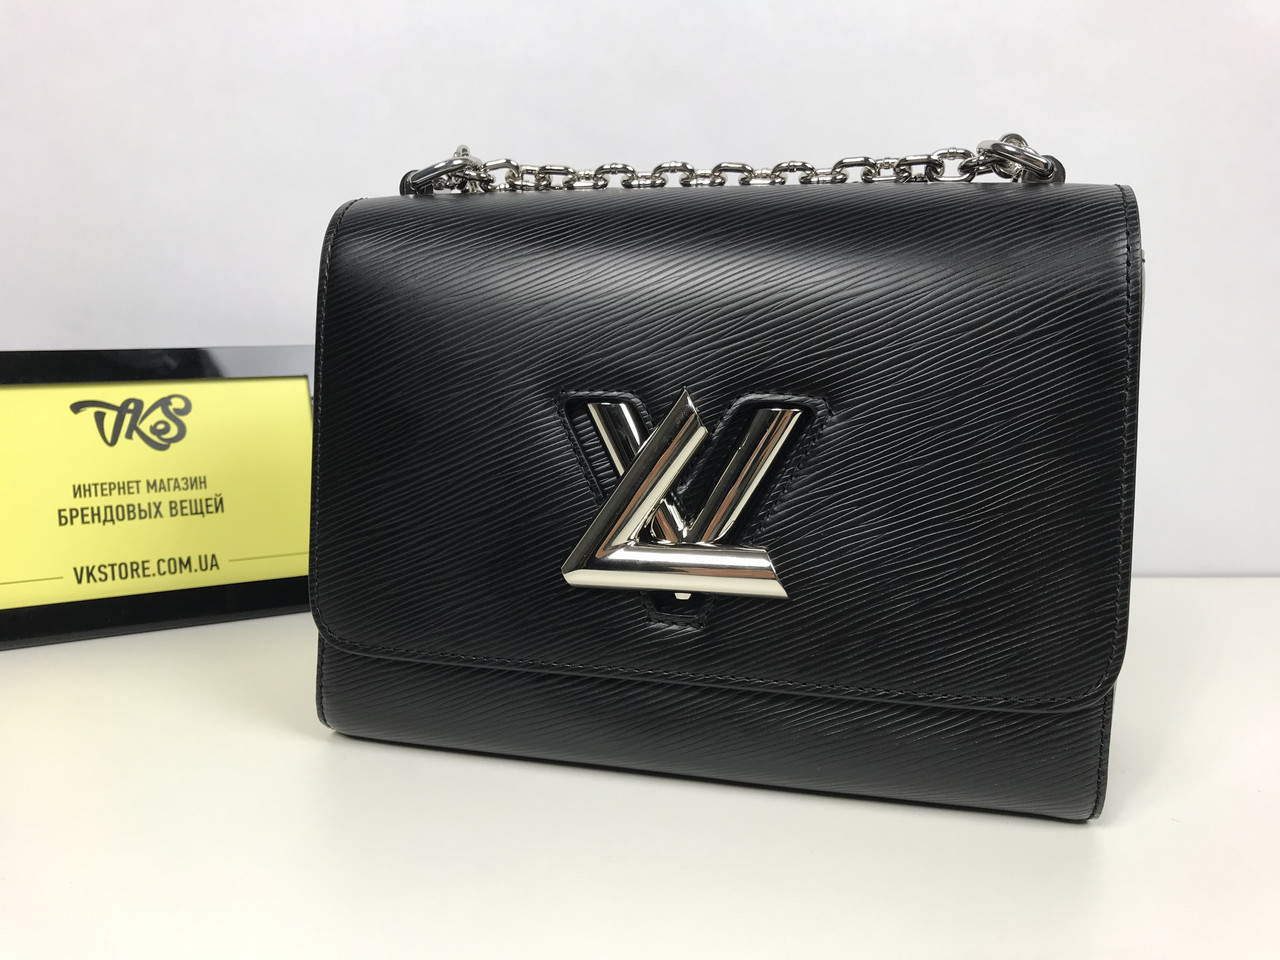 dd89f66e6fd3 Женский клатч Louis Vuitton Twist, цена 11 500 грн., купить в Киеве ...